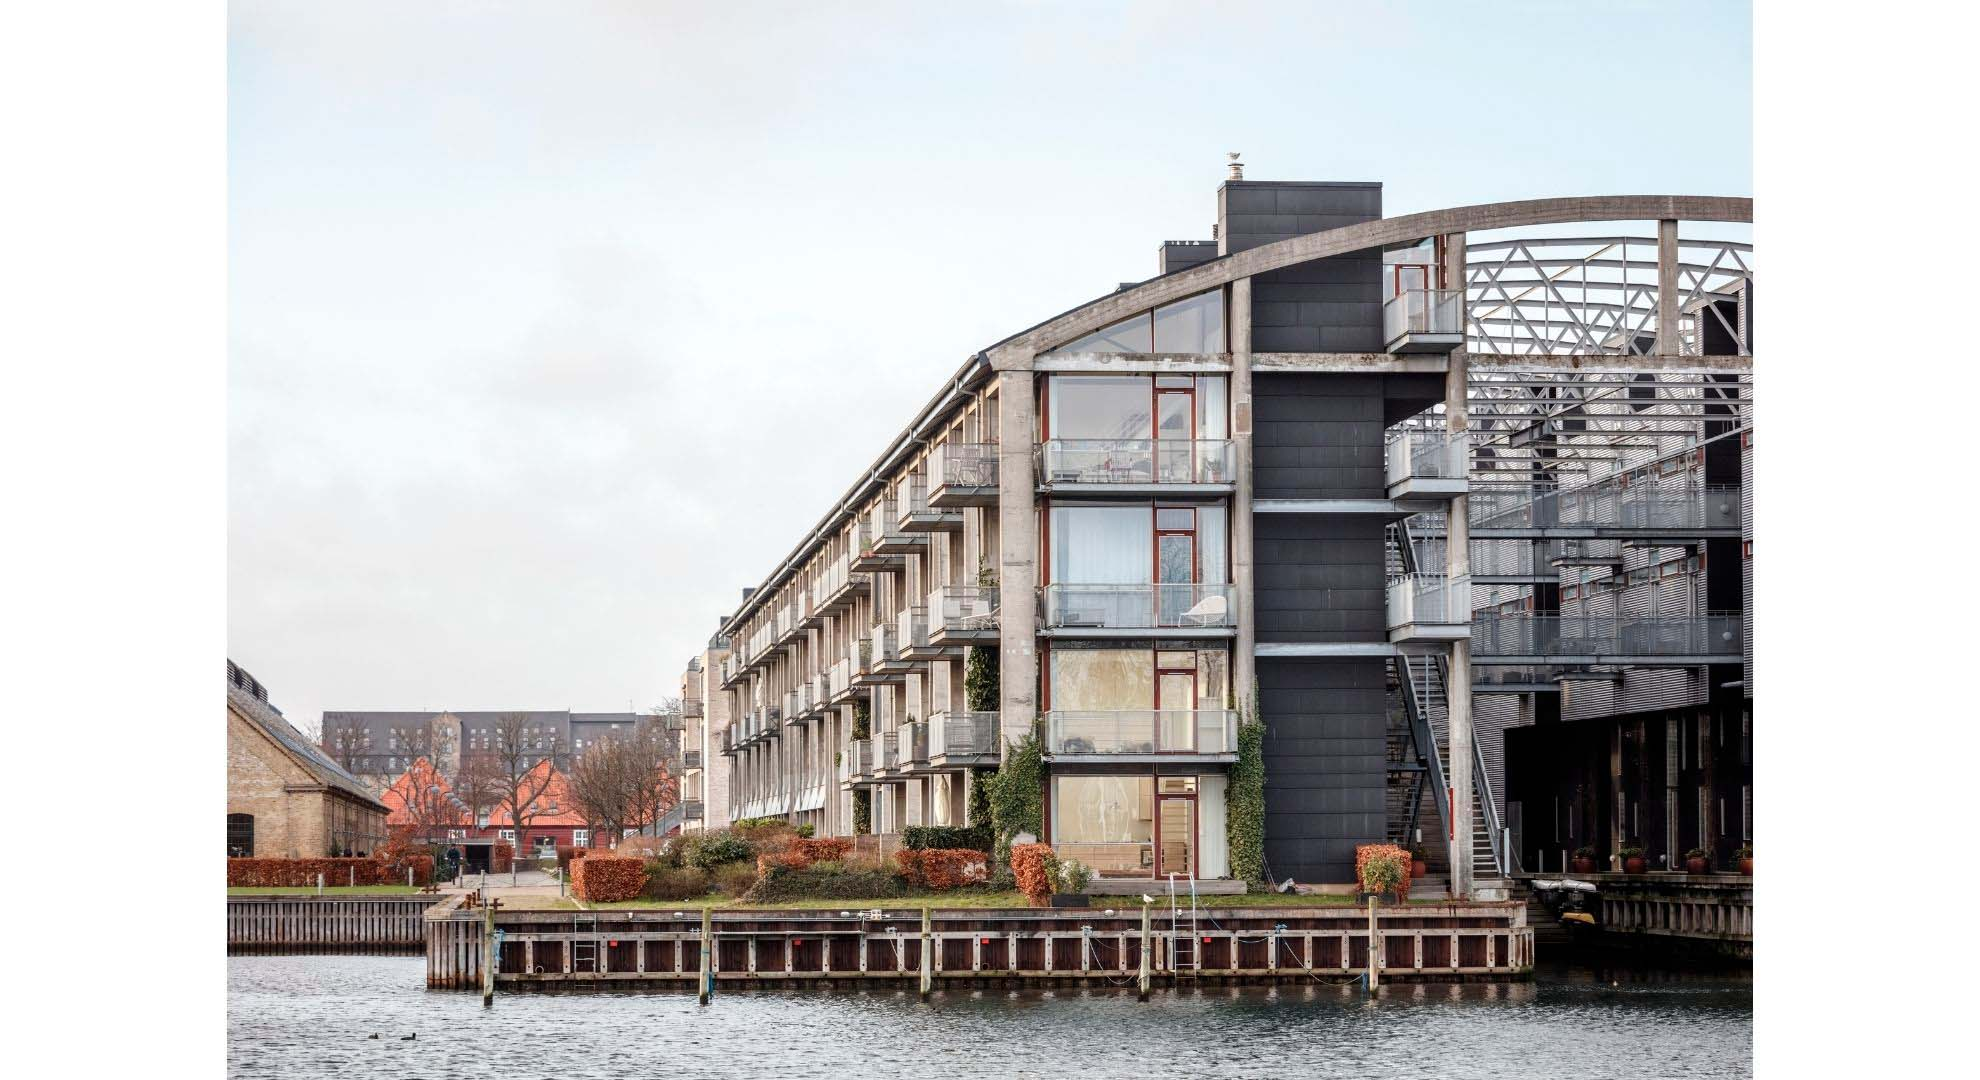 An adaptive reuse of a torpedo boat workshop for housing in Copenhagen.